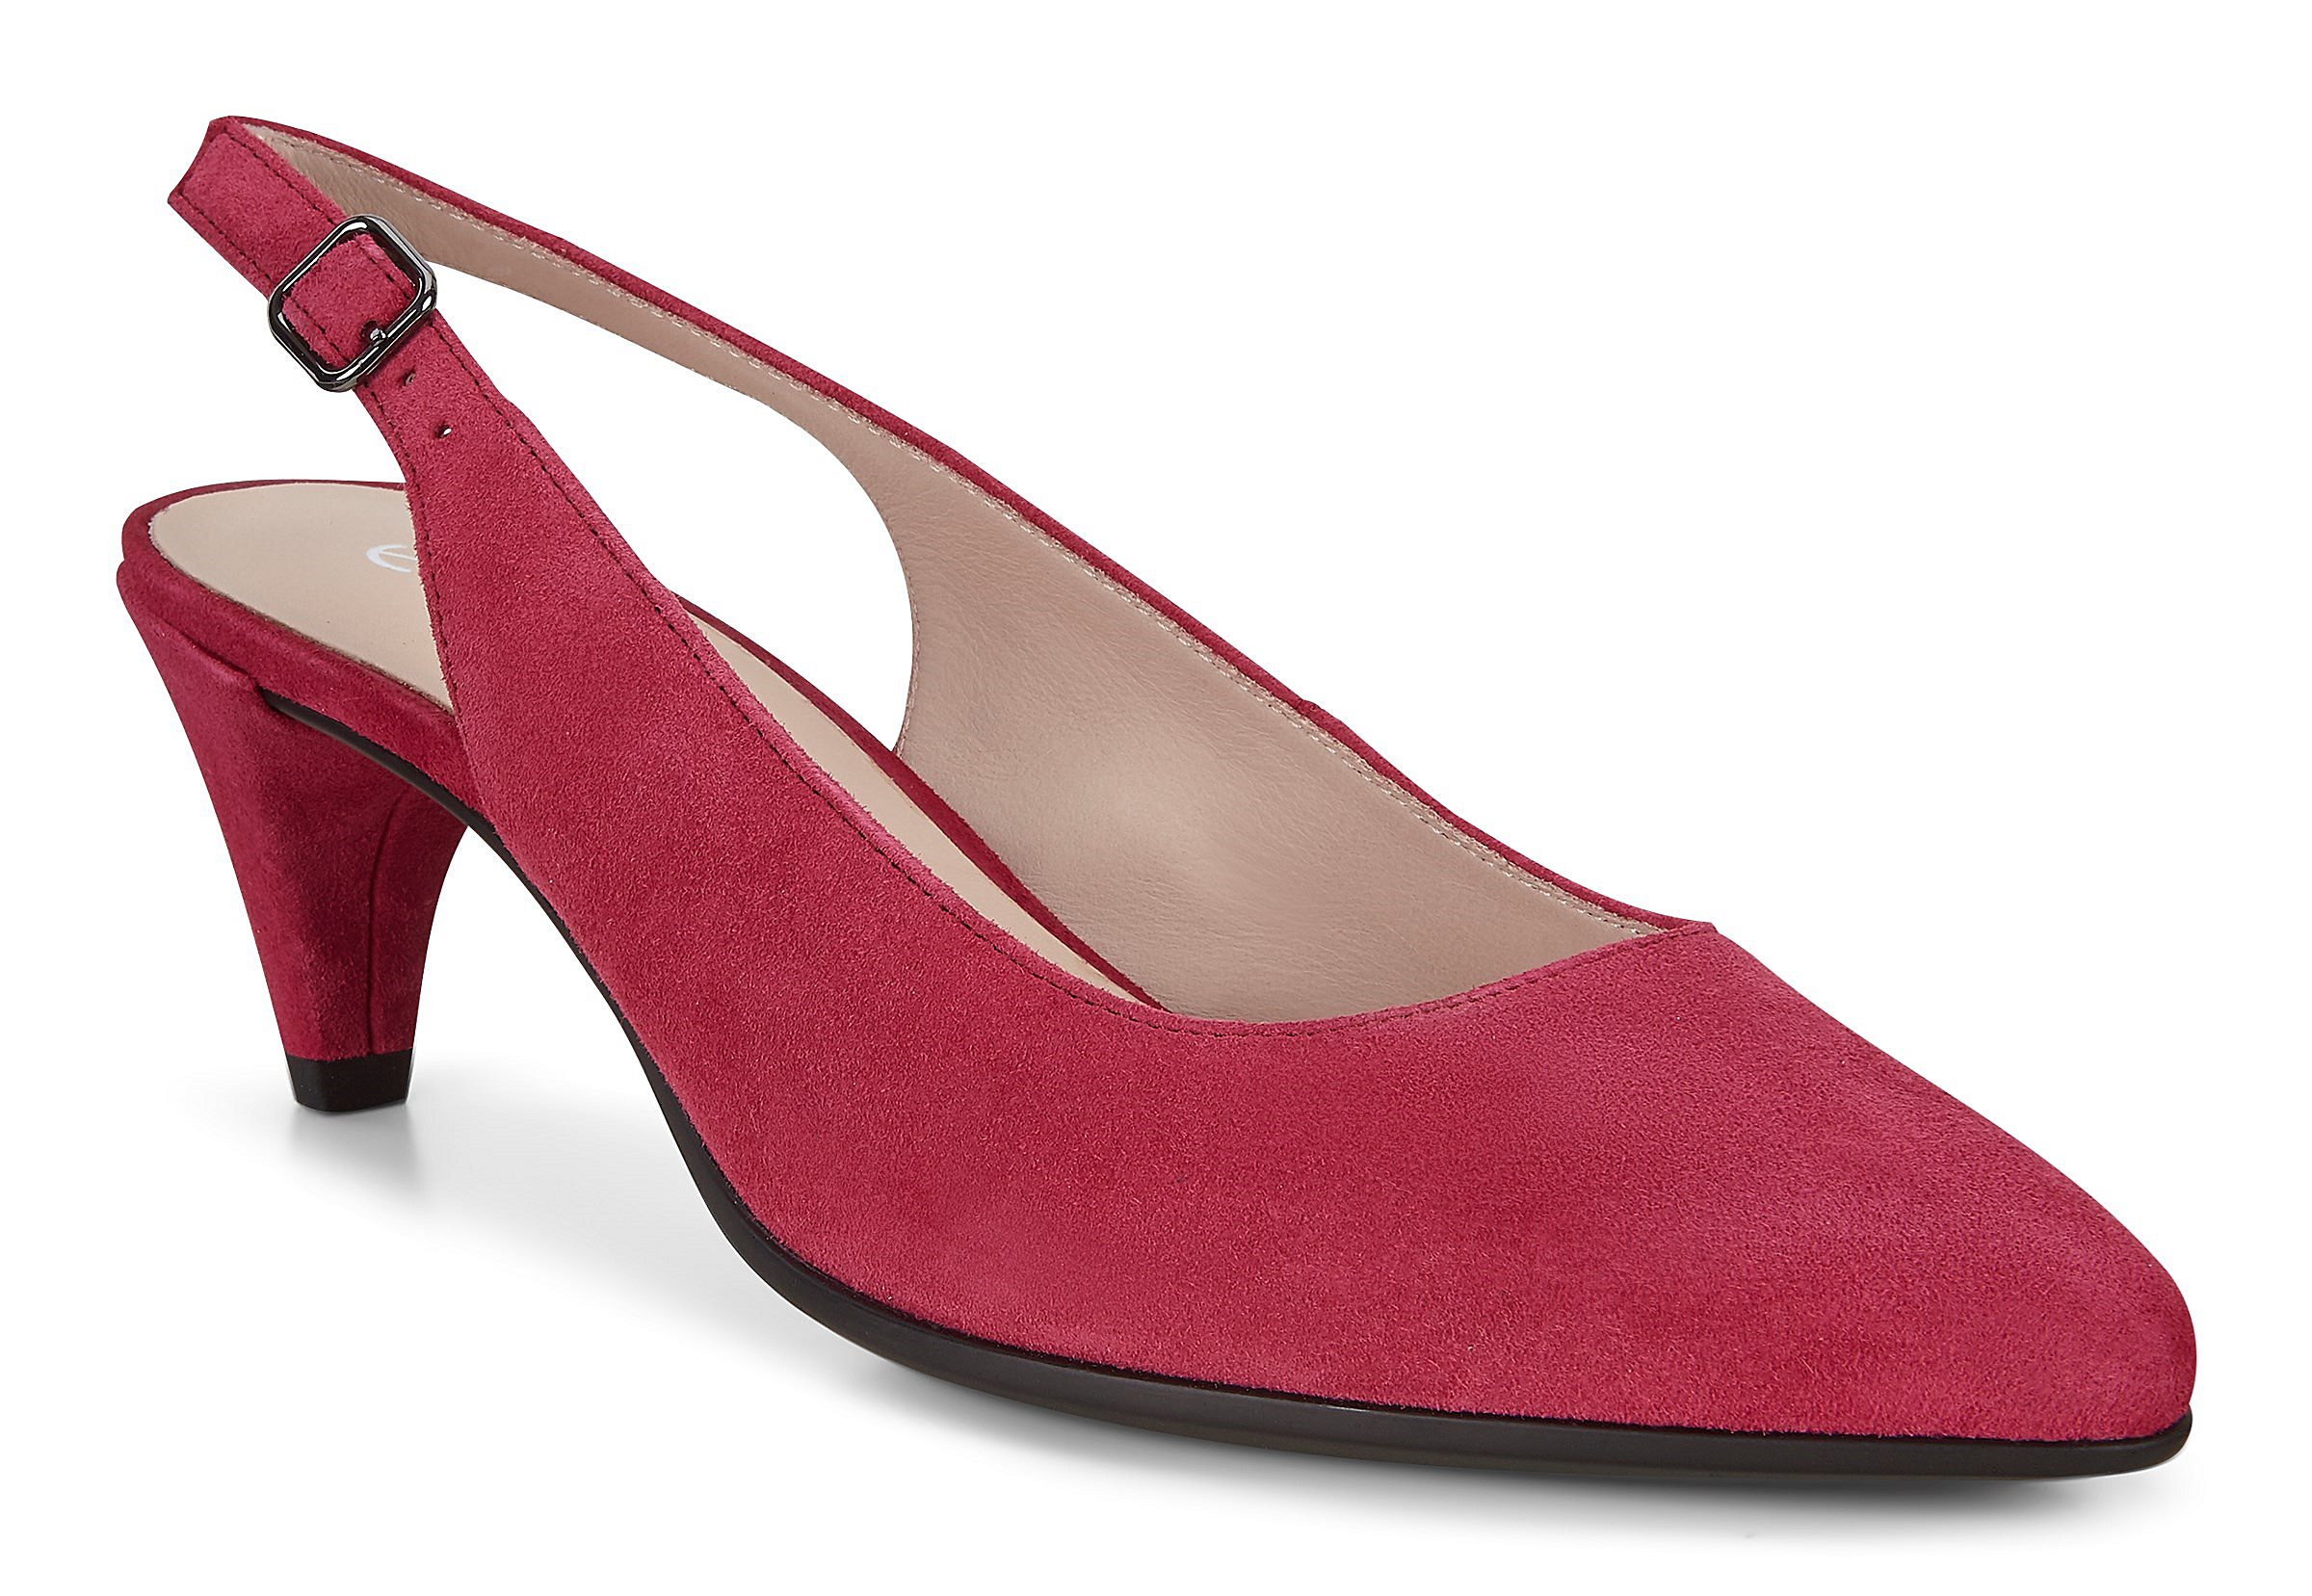 o 5 Sneaker Dames Ecco Soft Zwart V f Brekelmans Schoenen